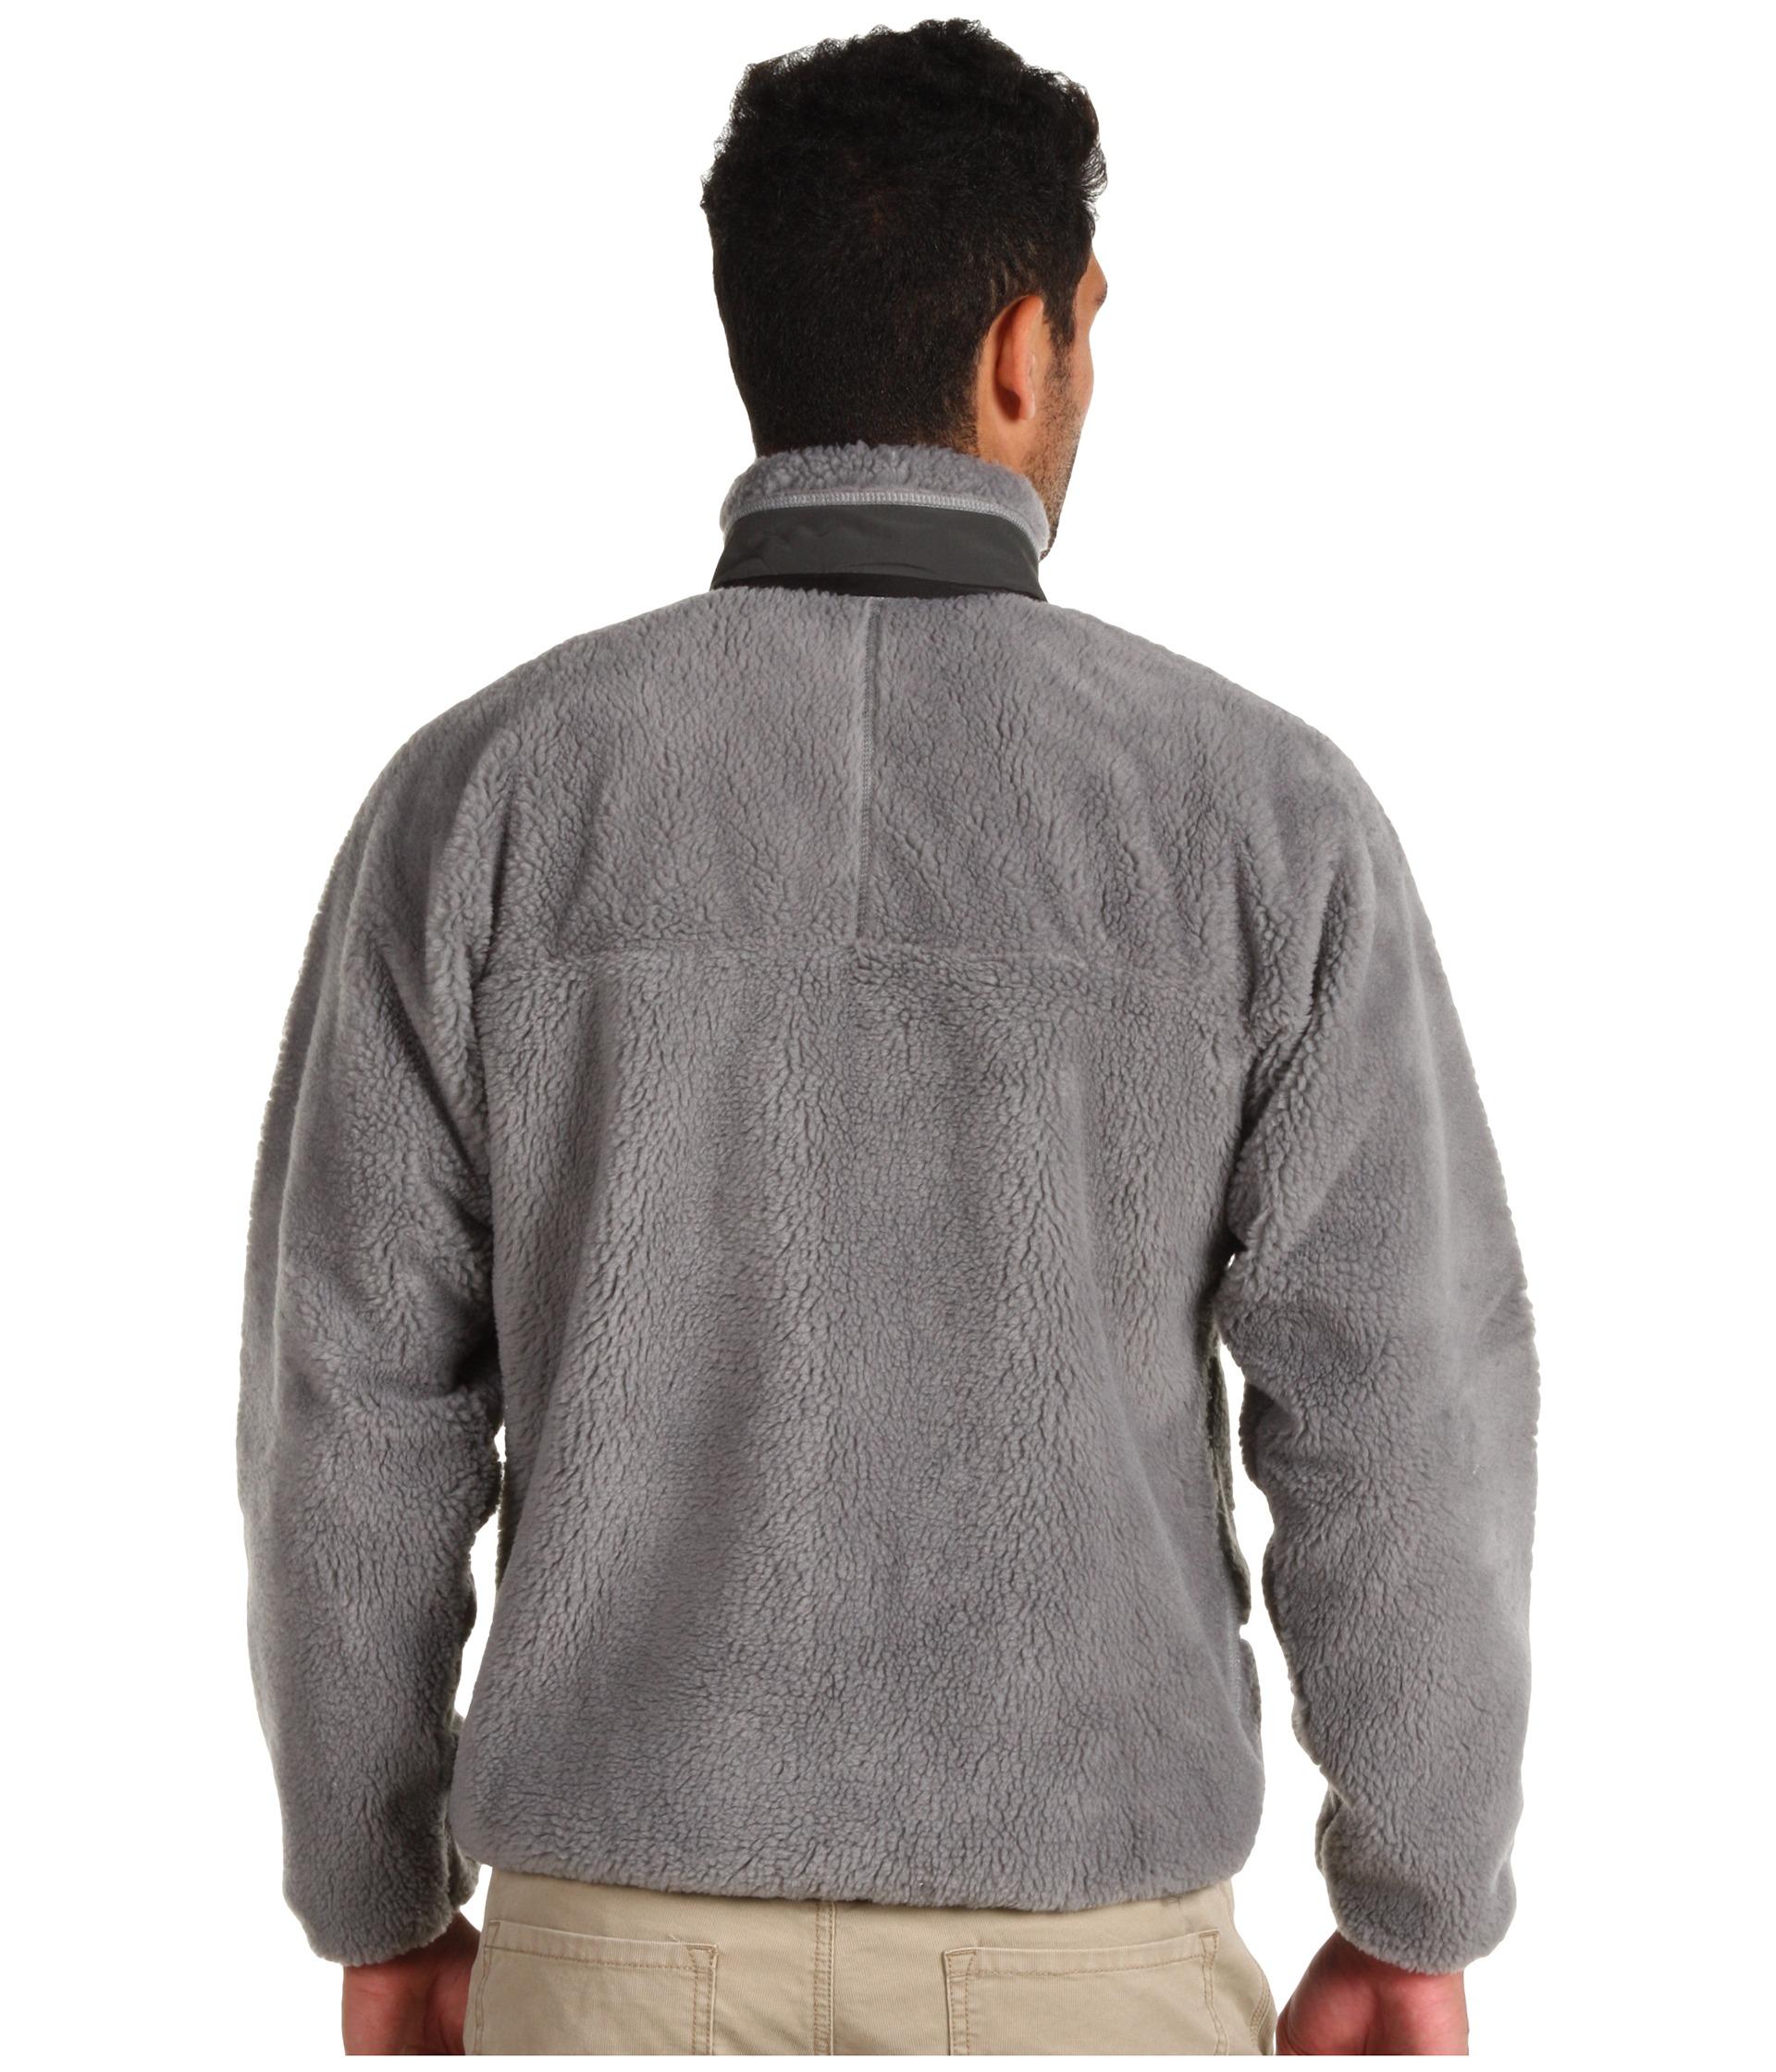 Patagonia Classic Retro X Jacket Shipped Free At Zappos